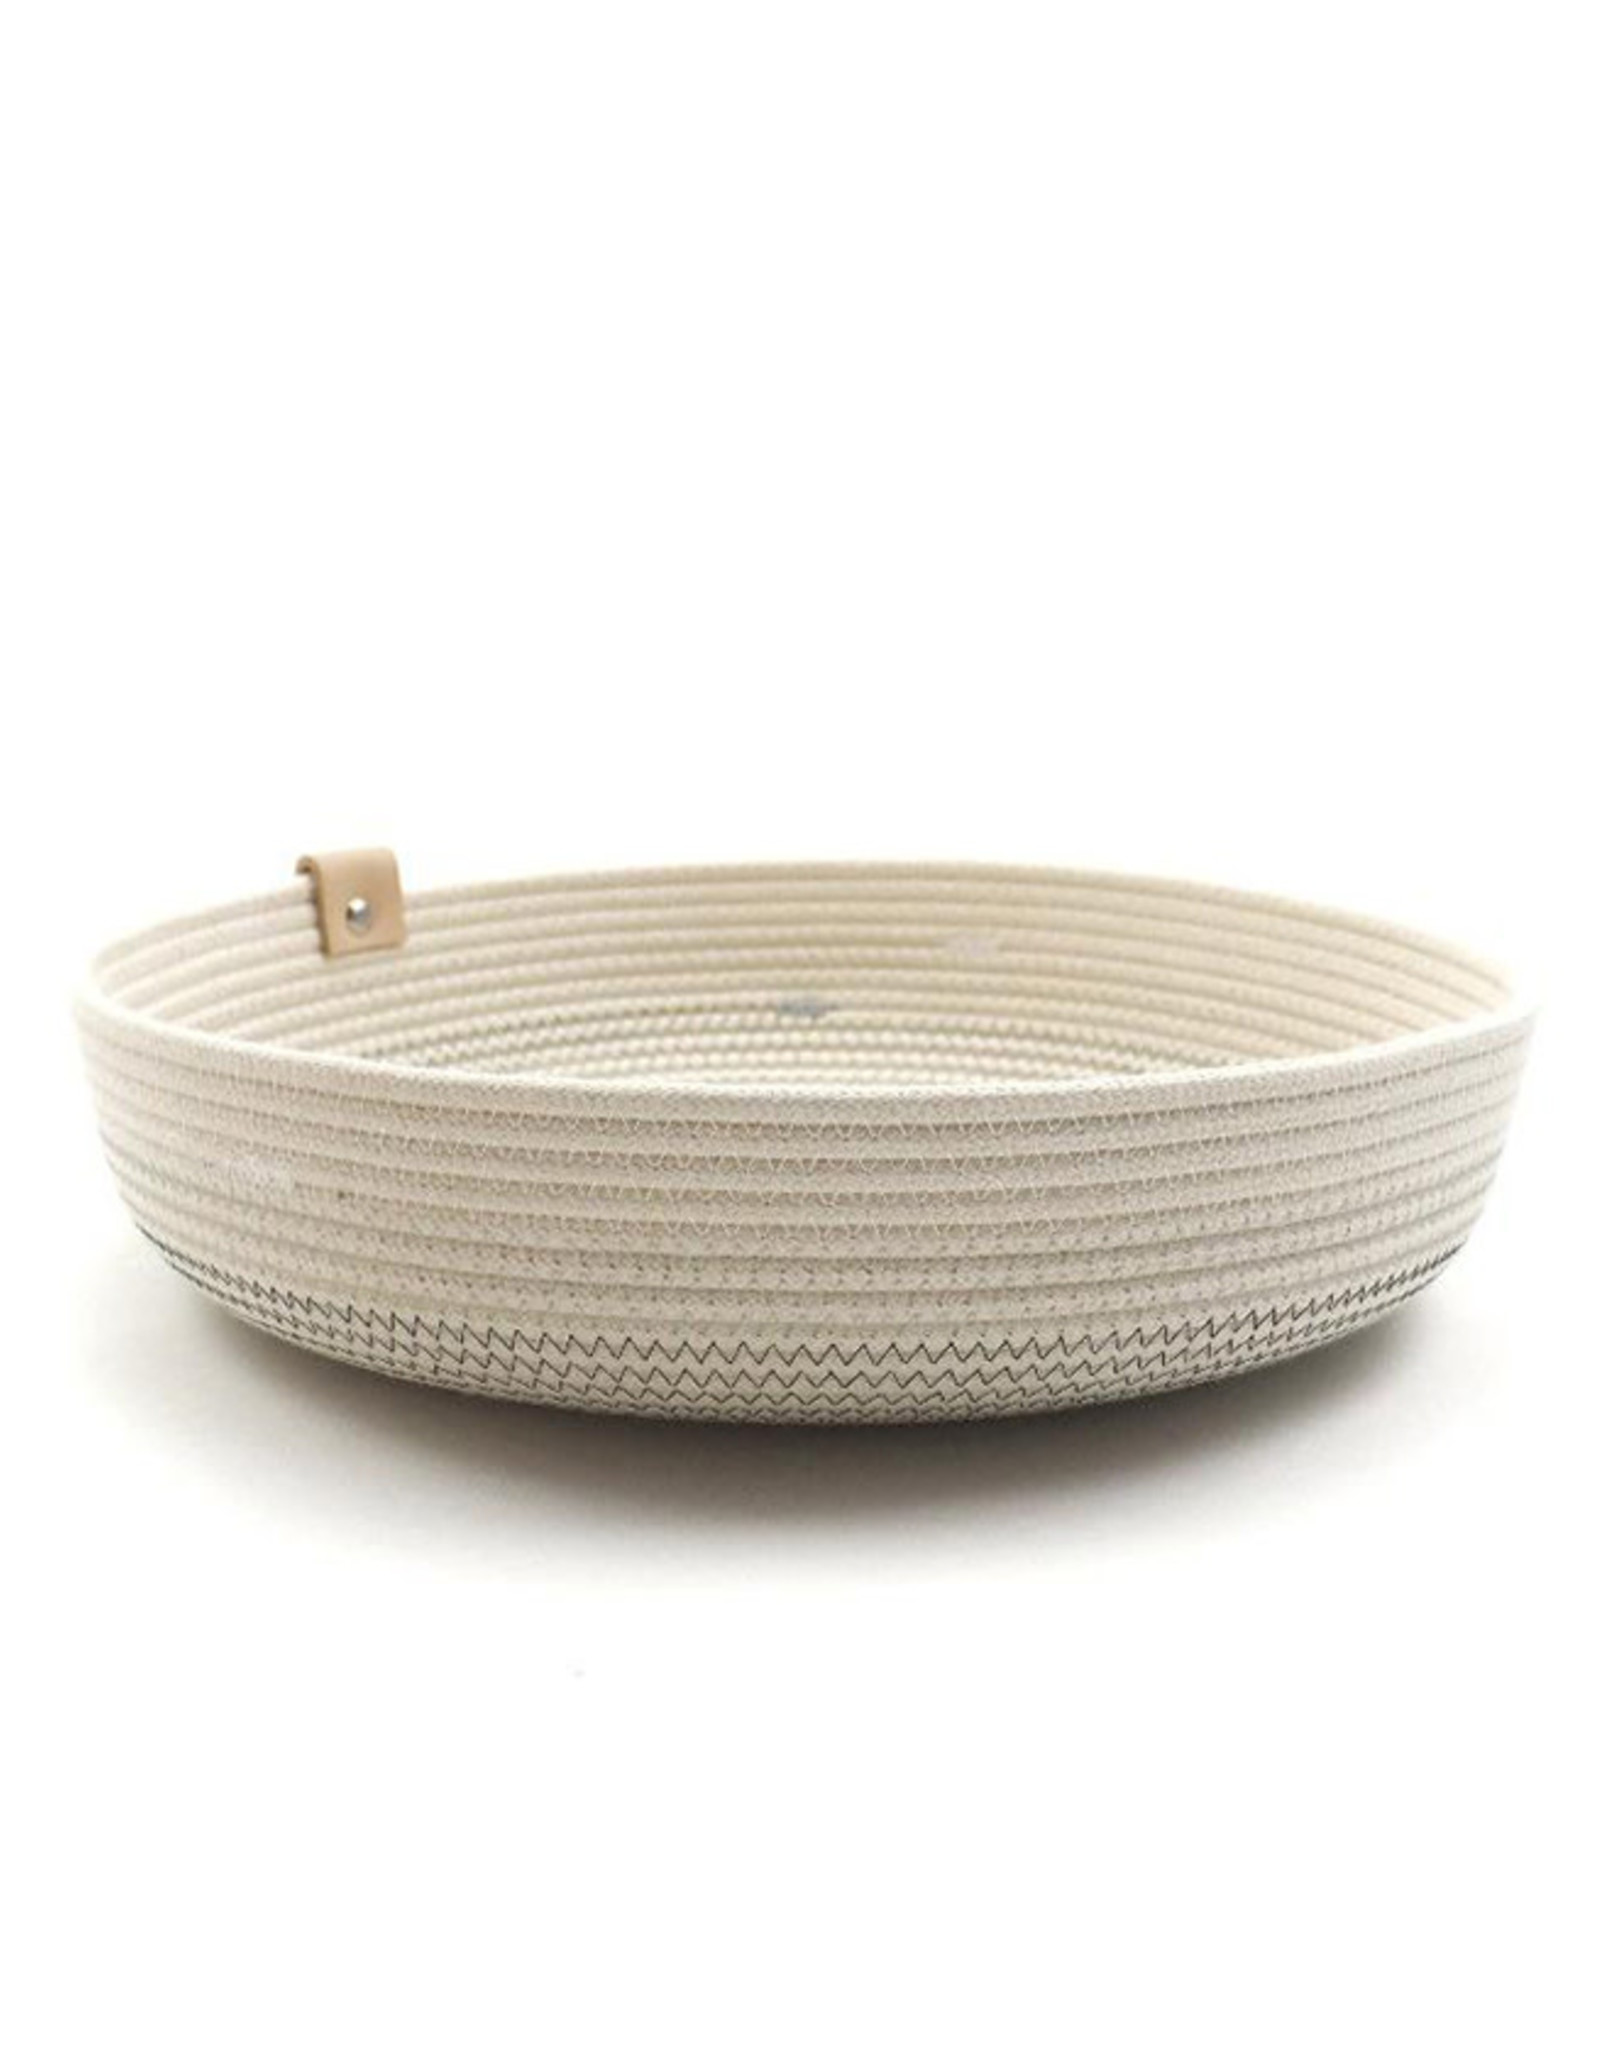 Koba Handmade Bowl Large Low-shades of grey 30x7cm